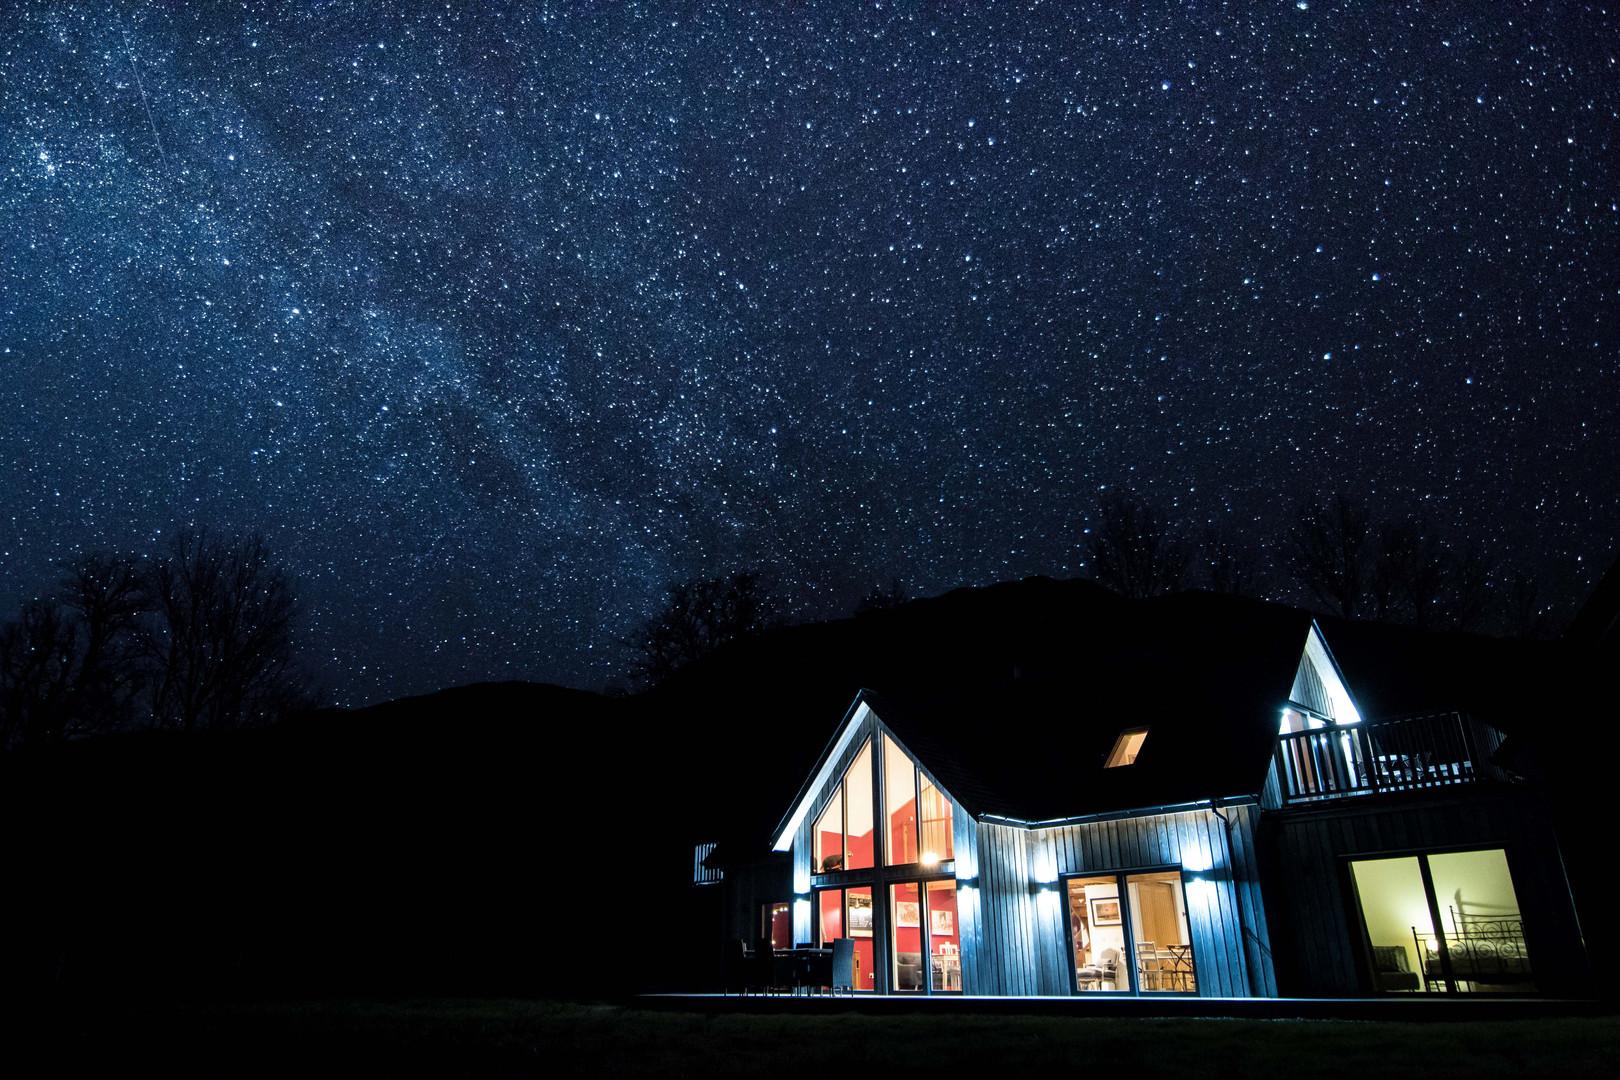 Stargazing at Knoydart River Cottage